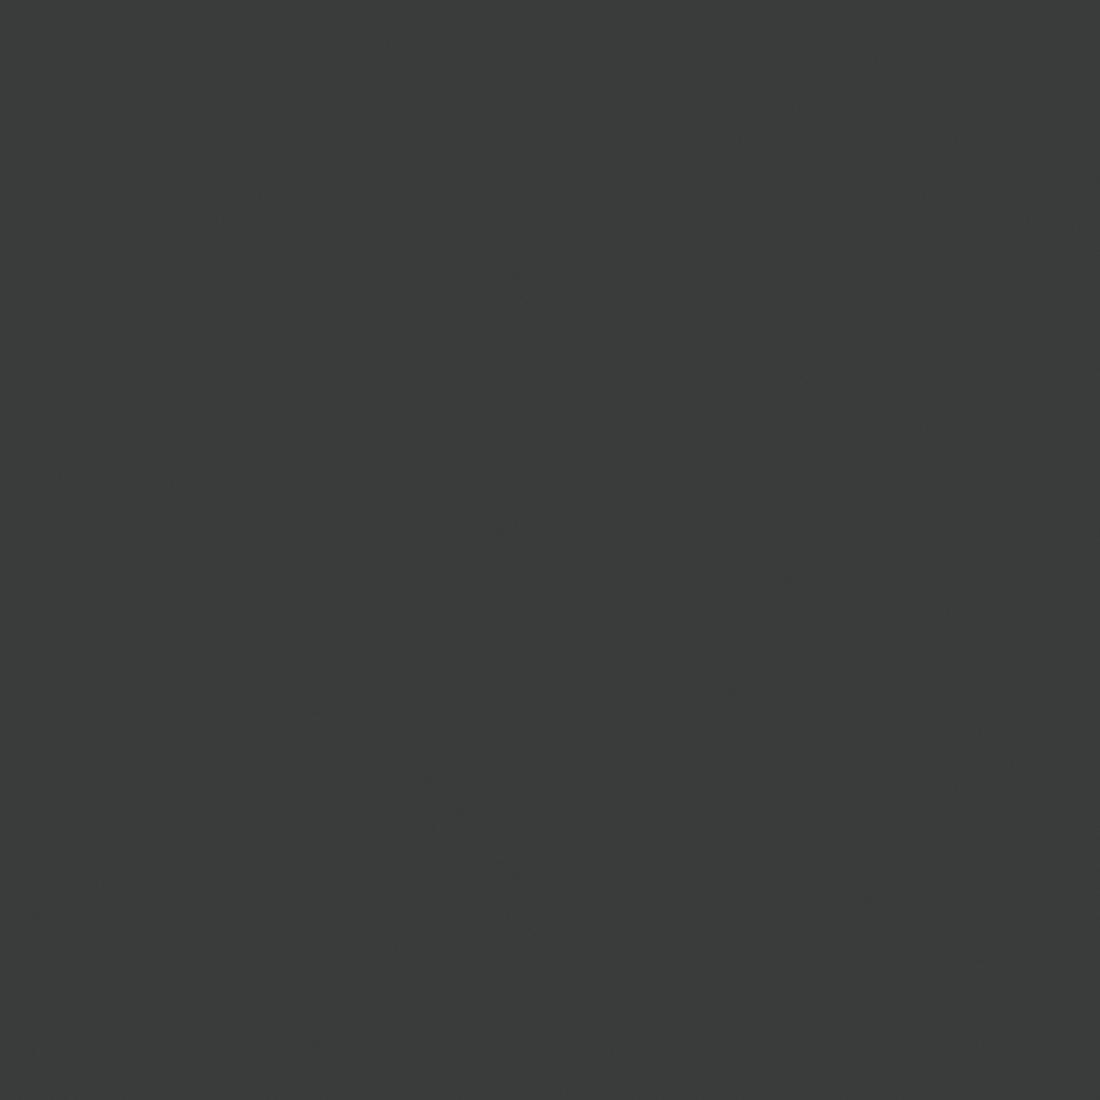 0164PE - Antracita